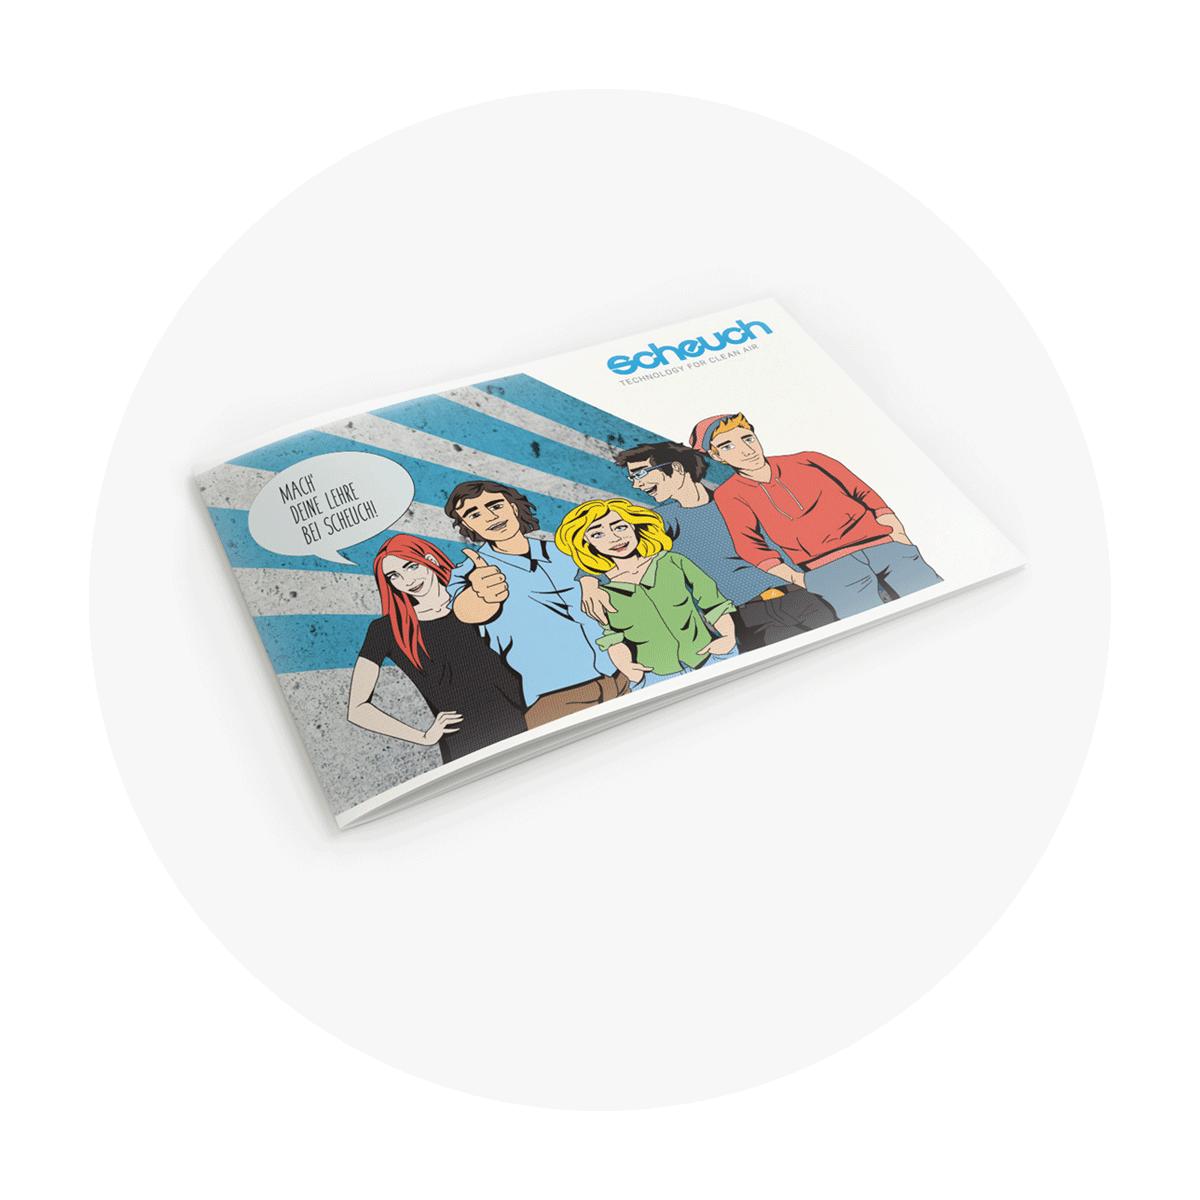 Scheuch Lehrlingsfolder Cover Mockup